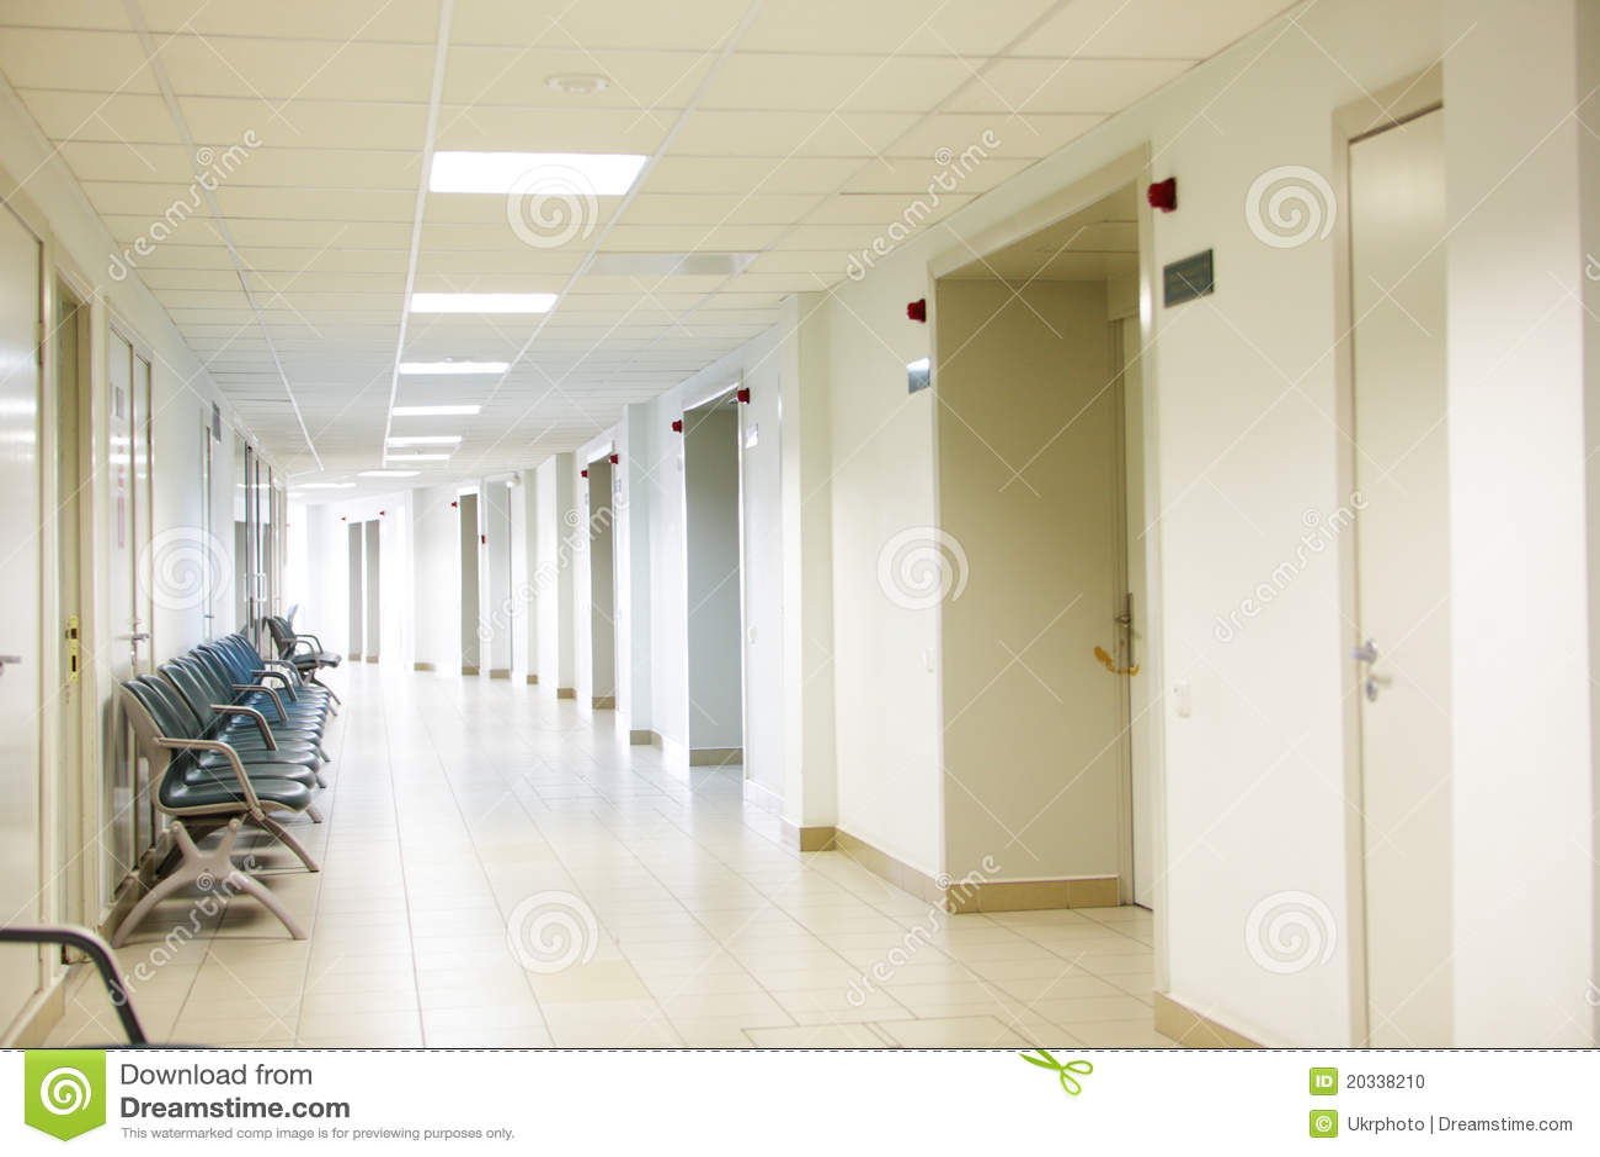 Hospital Interior Stock Photo Image 20338210